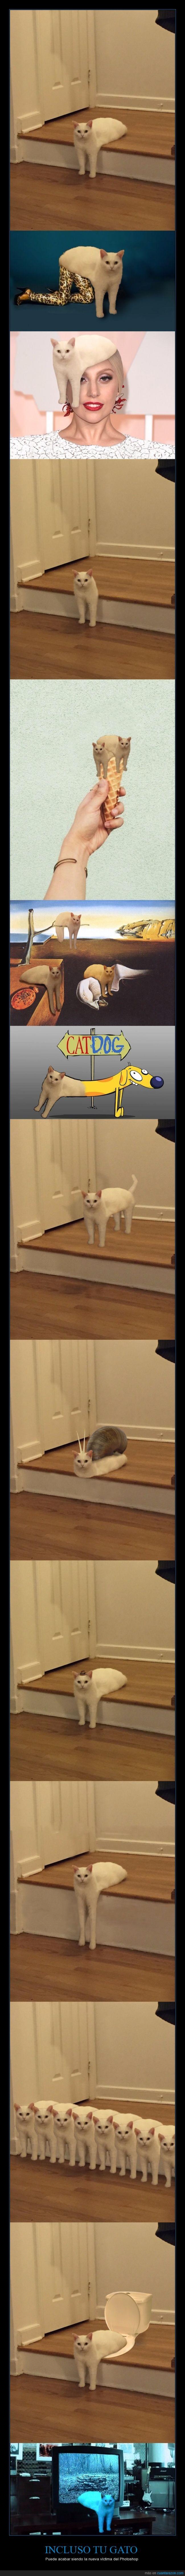 blanco,catdog,chop,gatigooooooos,gato,patas,photoshop